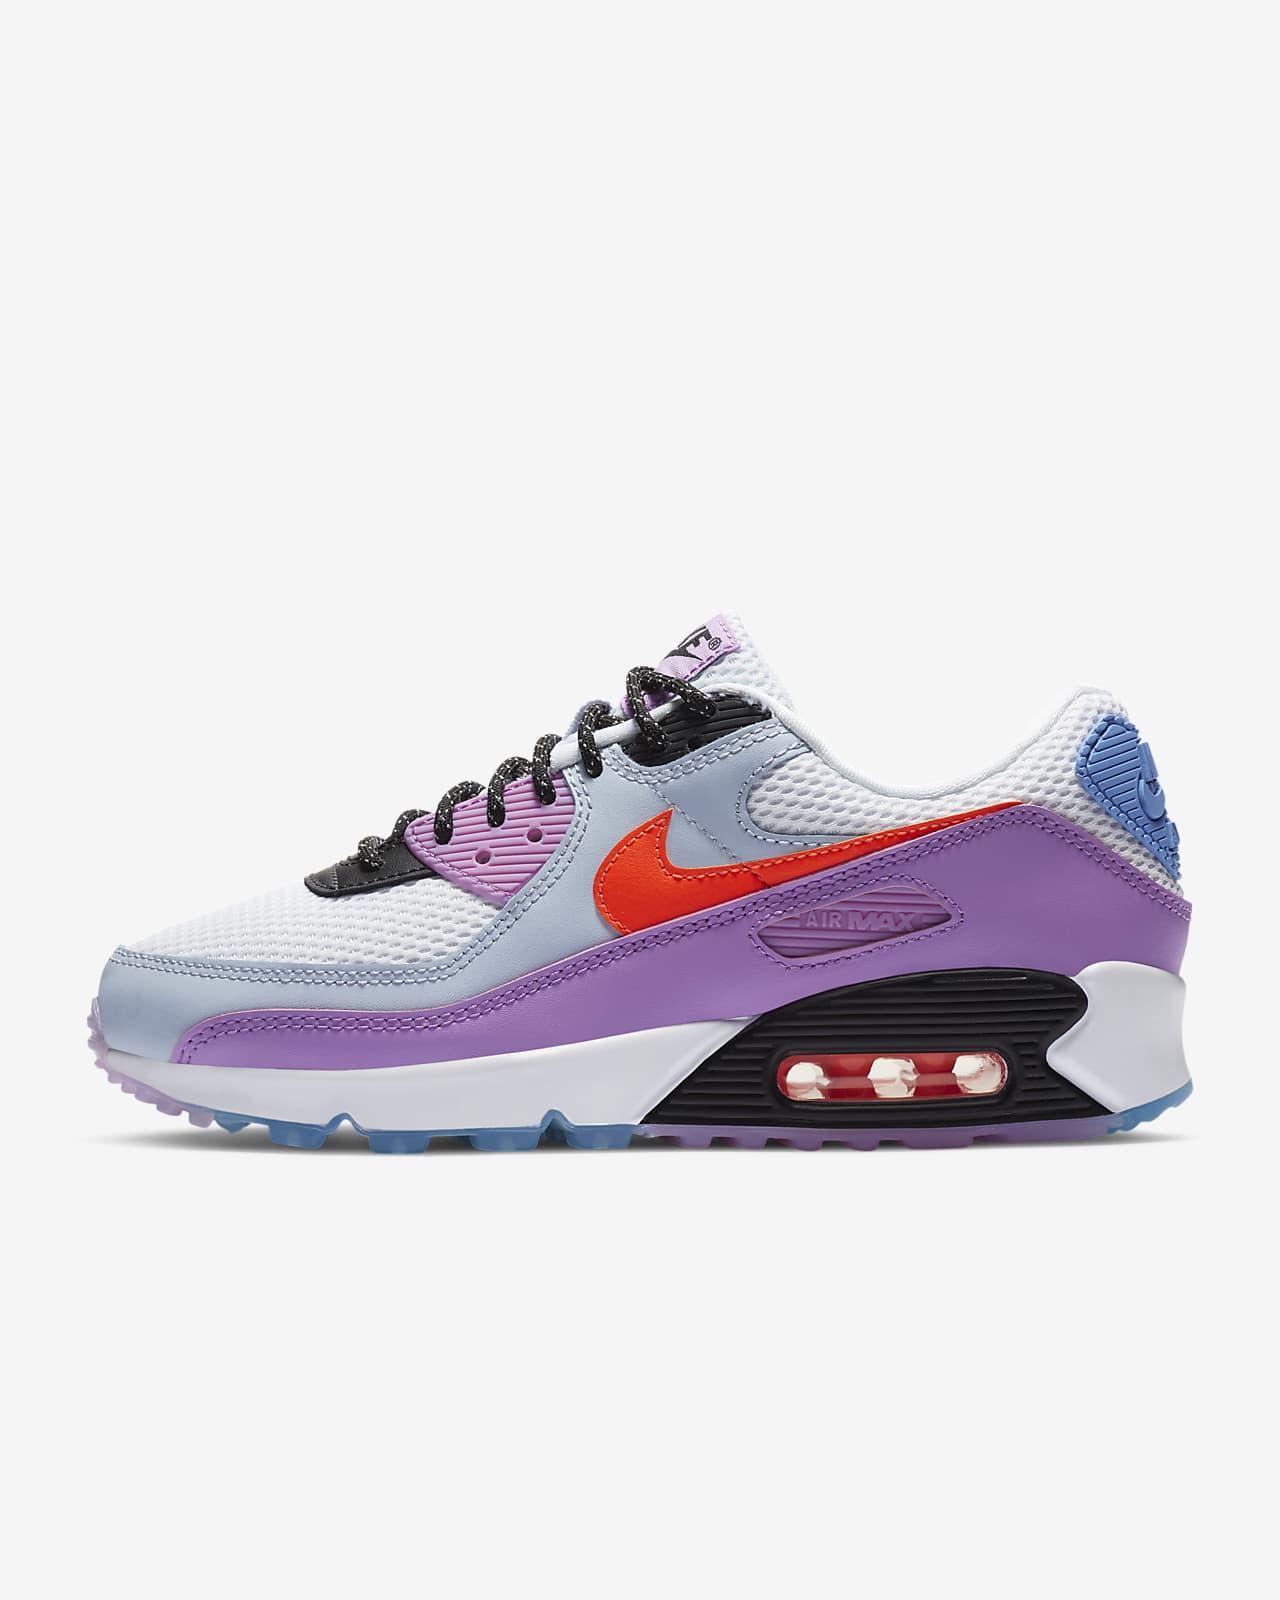 nike air max in purple